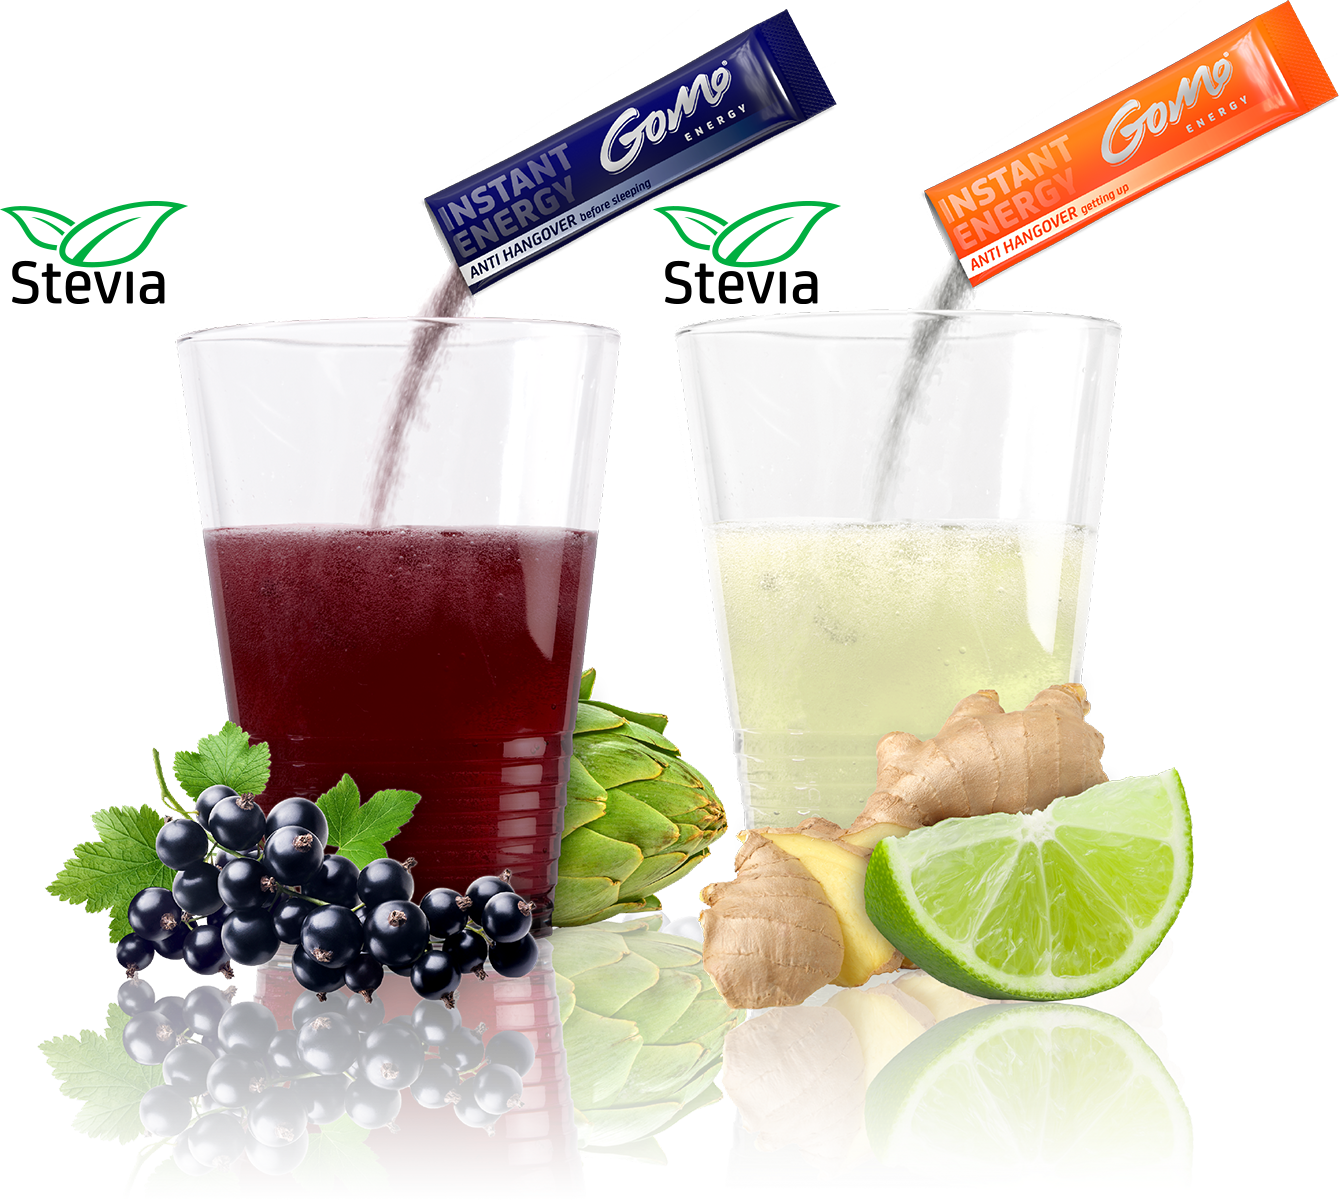 GoMo ENERGY gegen Müdikgkeit gegen Hangover Anti-Hangover low carb zuckerfrei sportgetränk konzentration focus mehr